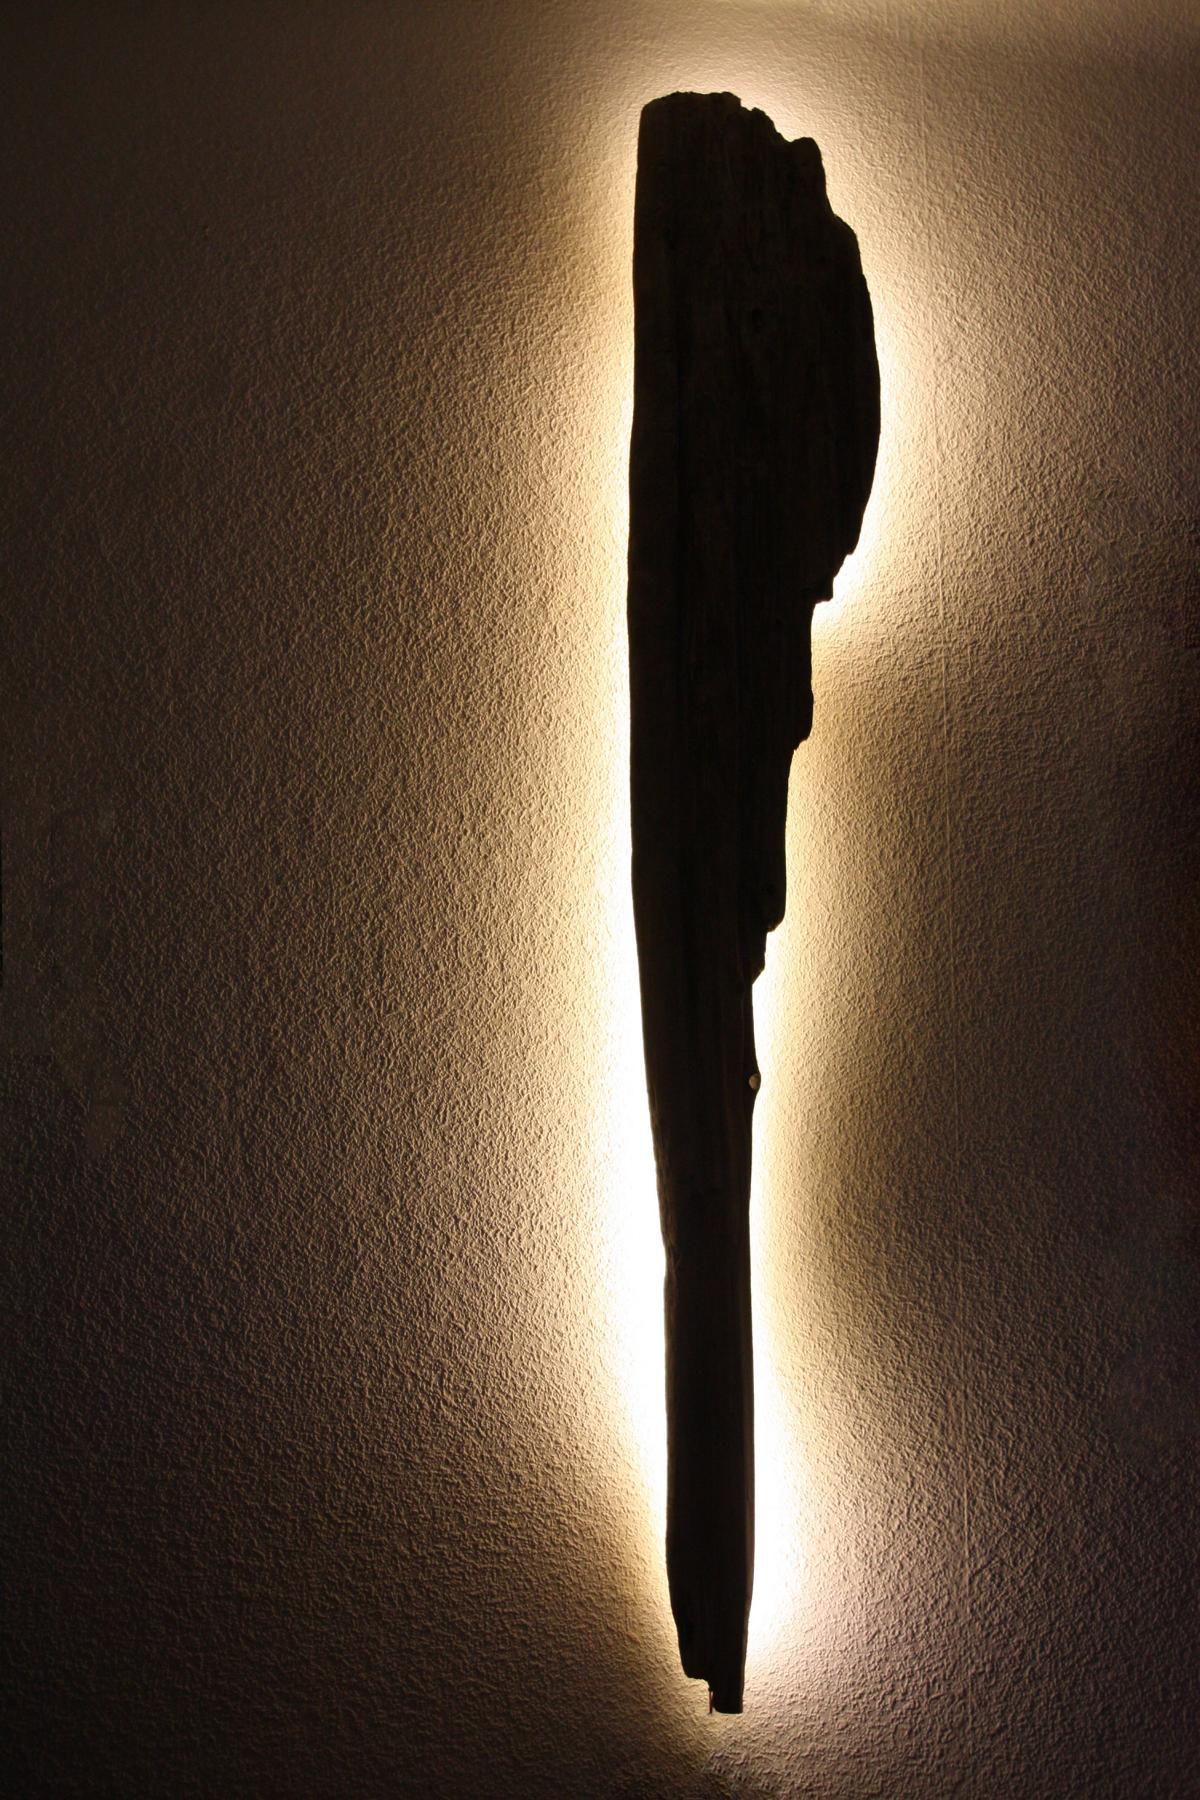 Einmalige treibholz lampen schwemmholz lampen - Wandlampe holz basteln ...